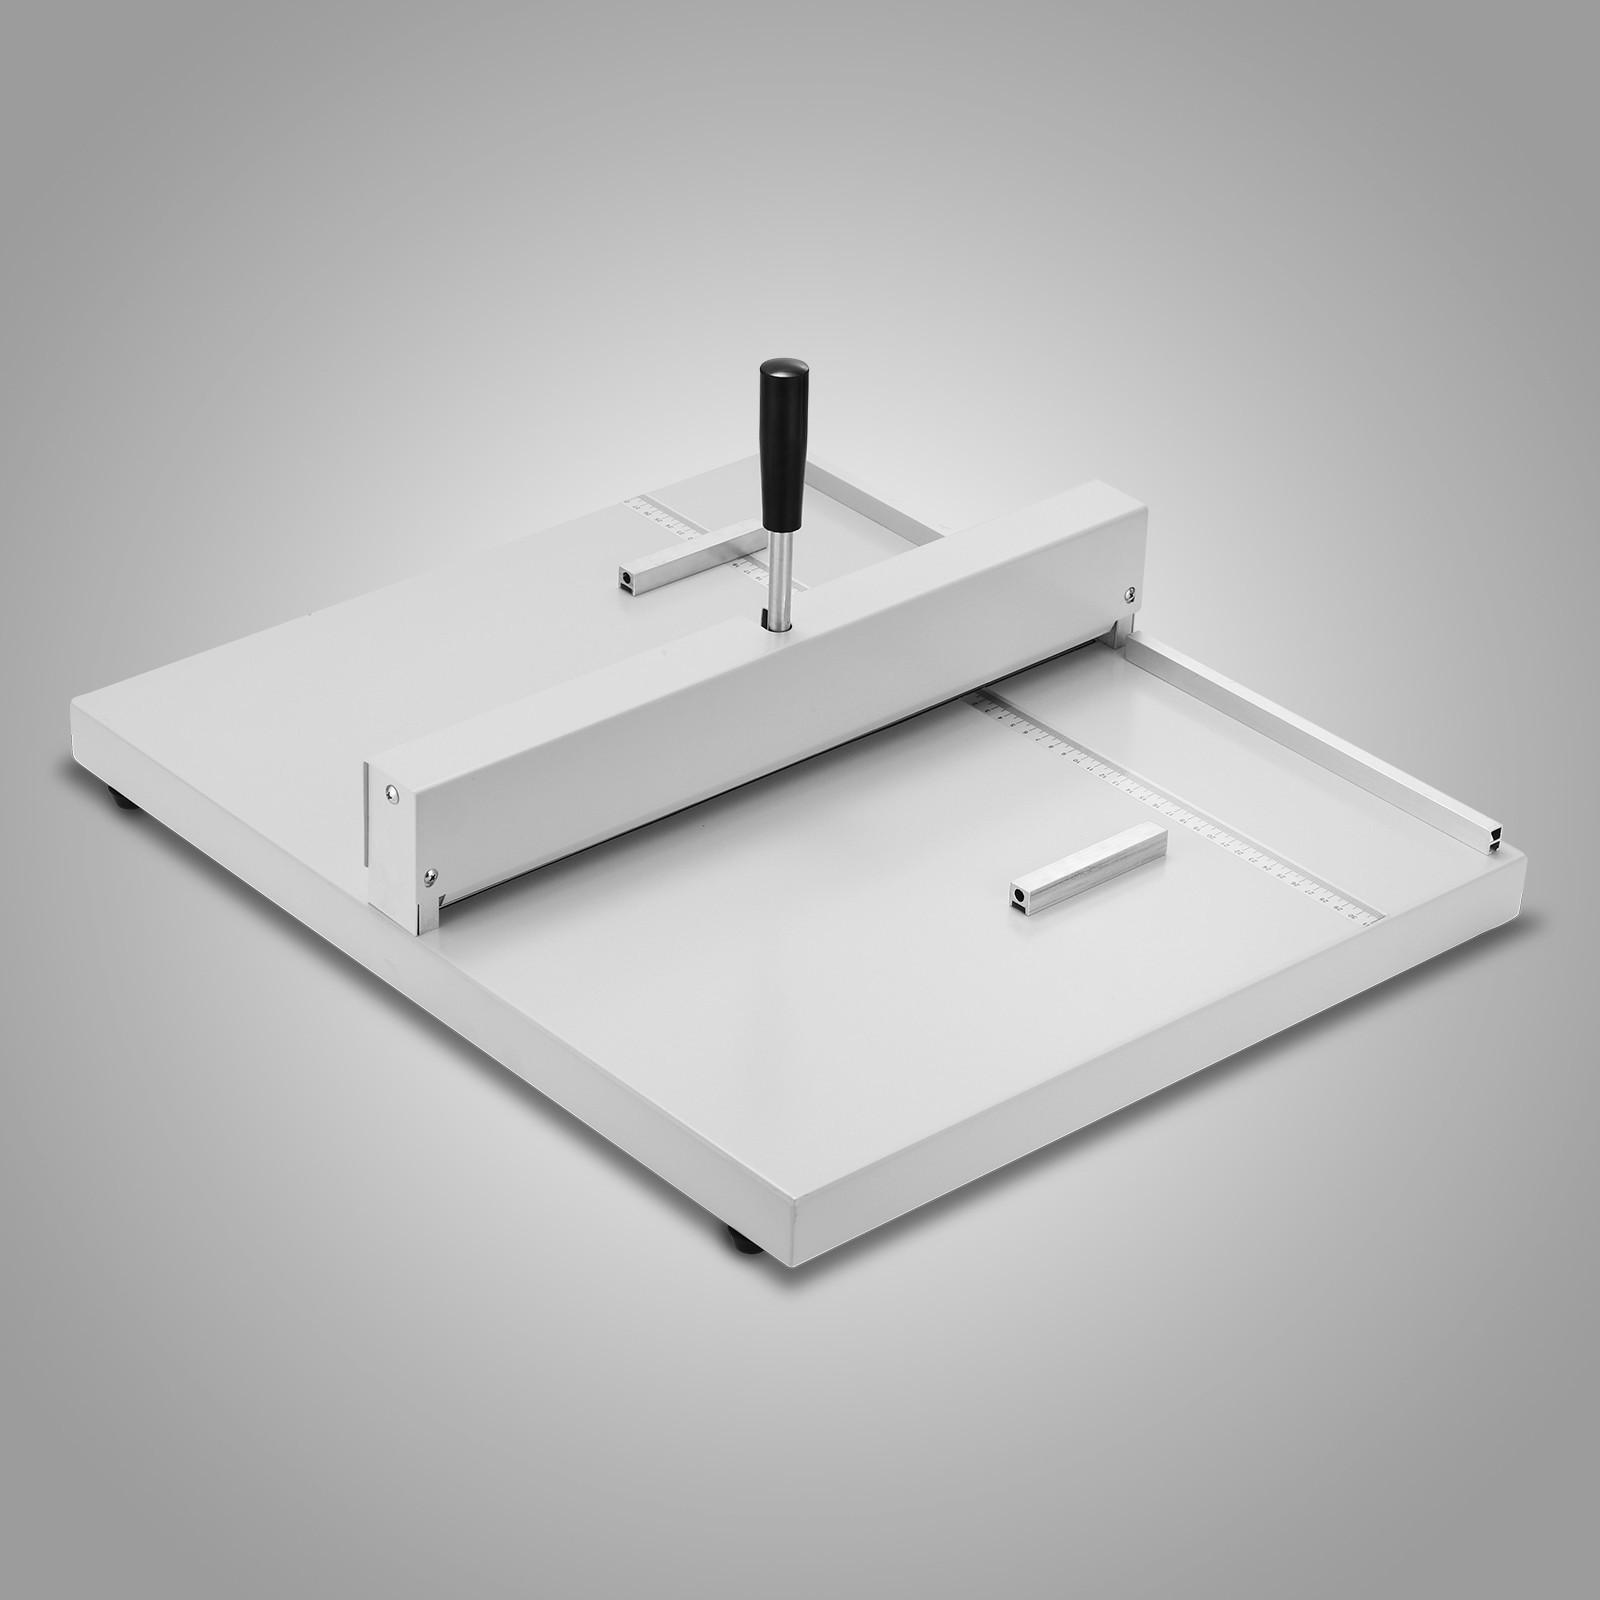 Cordonatrice-Perforatrice-Max-350-520mm-Profondita-Regolabile-Elettrica-Manuale miniatura 38